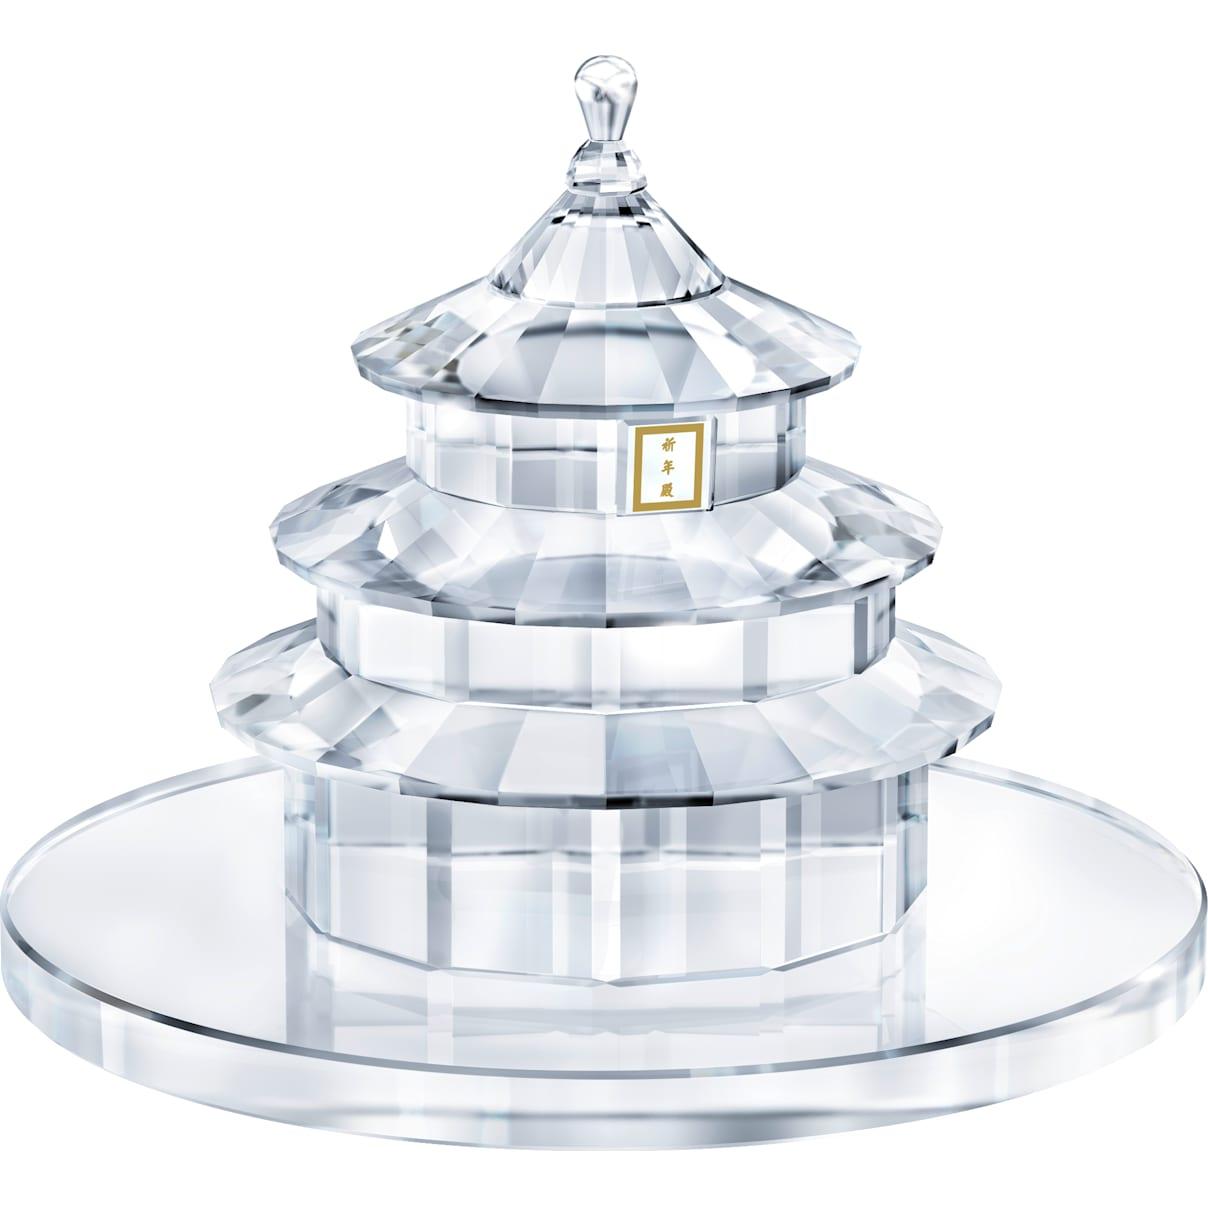 Swarovski Temple of Heaven